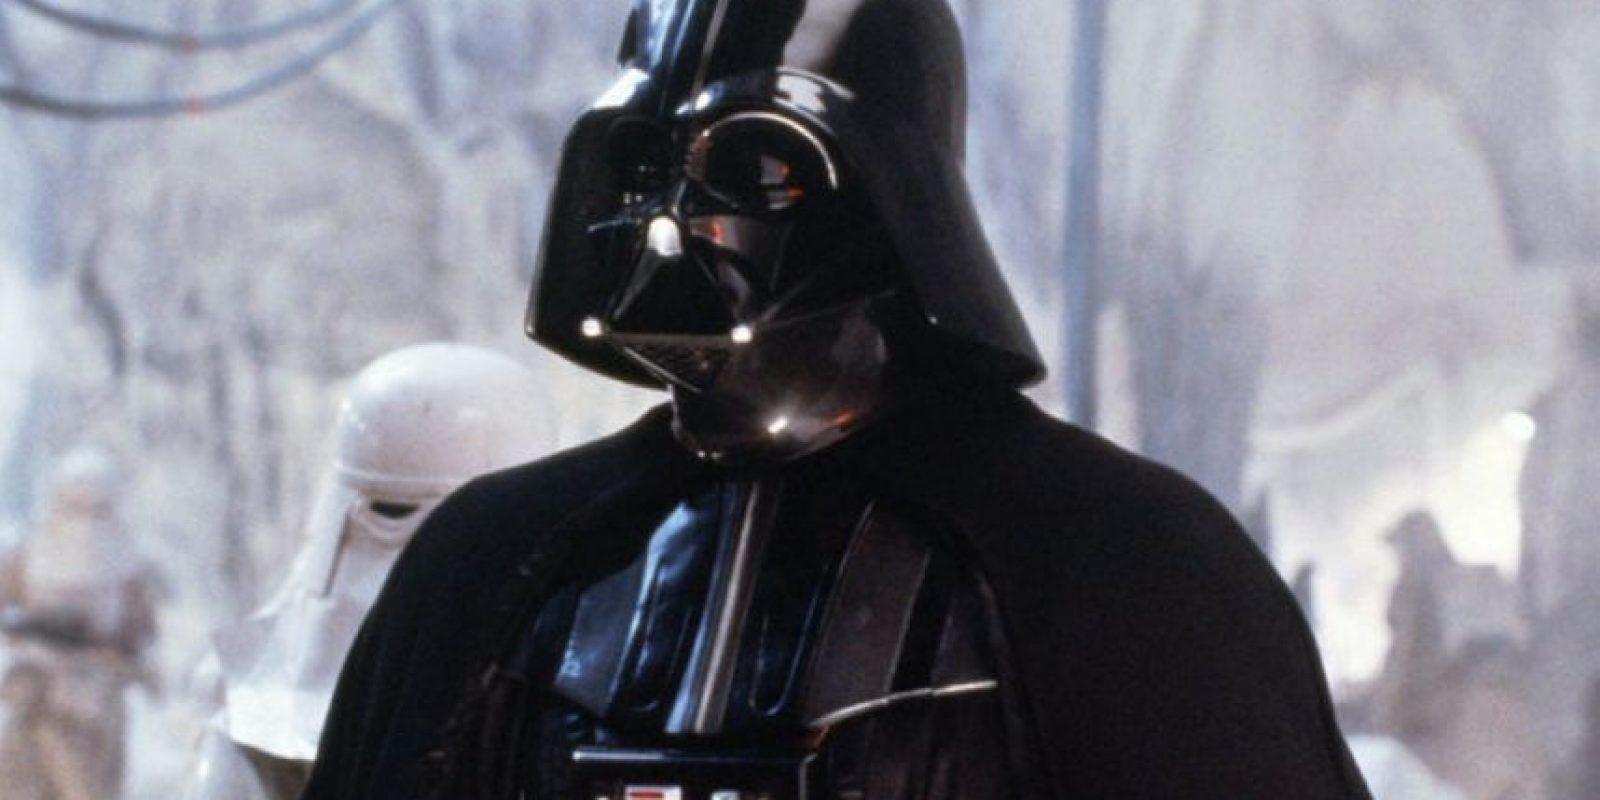 6 datos interesantes sobre Darth Vader Foto:Vía latino.starwars.com